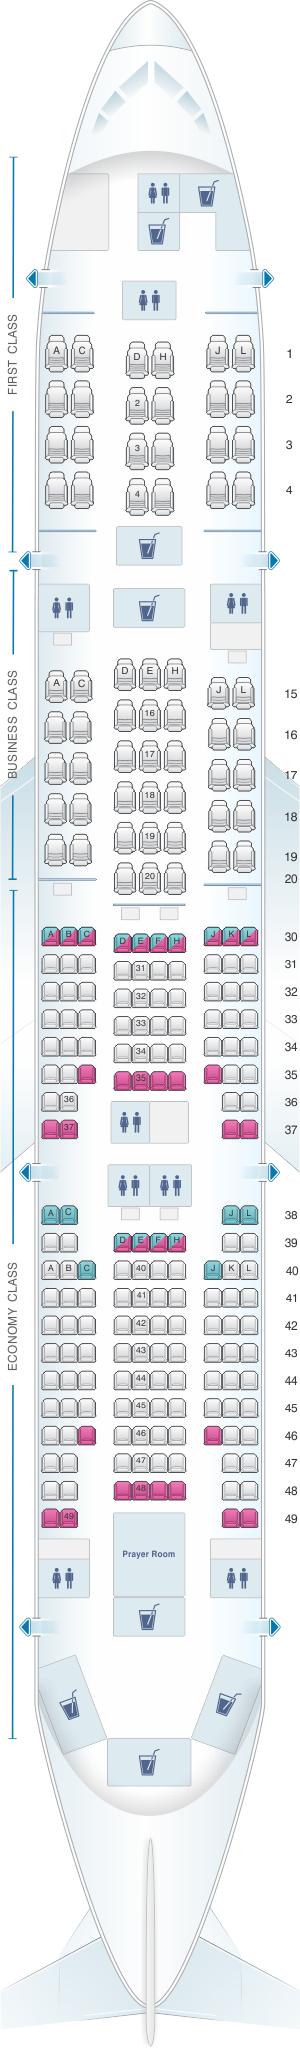 Seat map for Saudi Arabian Airlines Boeing B777 268 (77L)